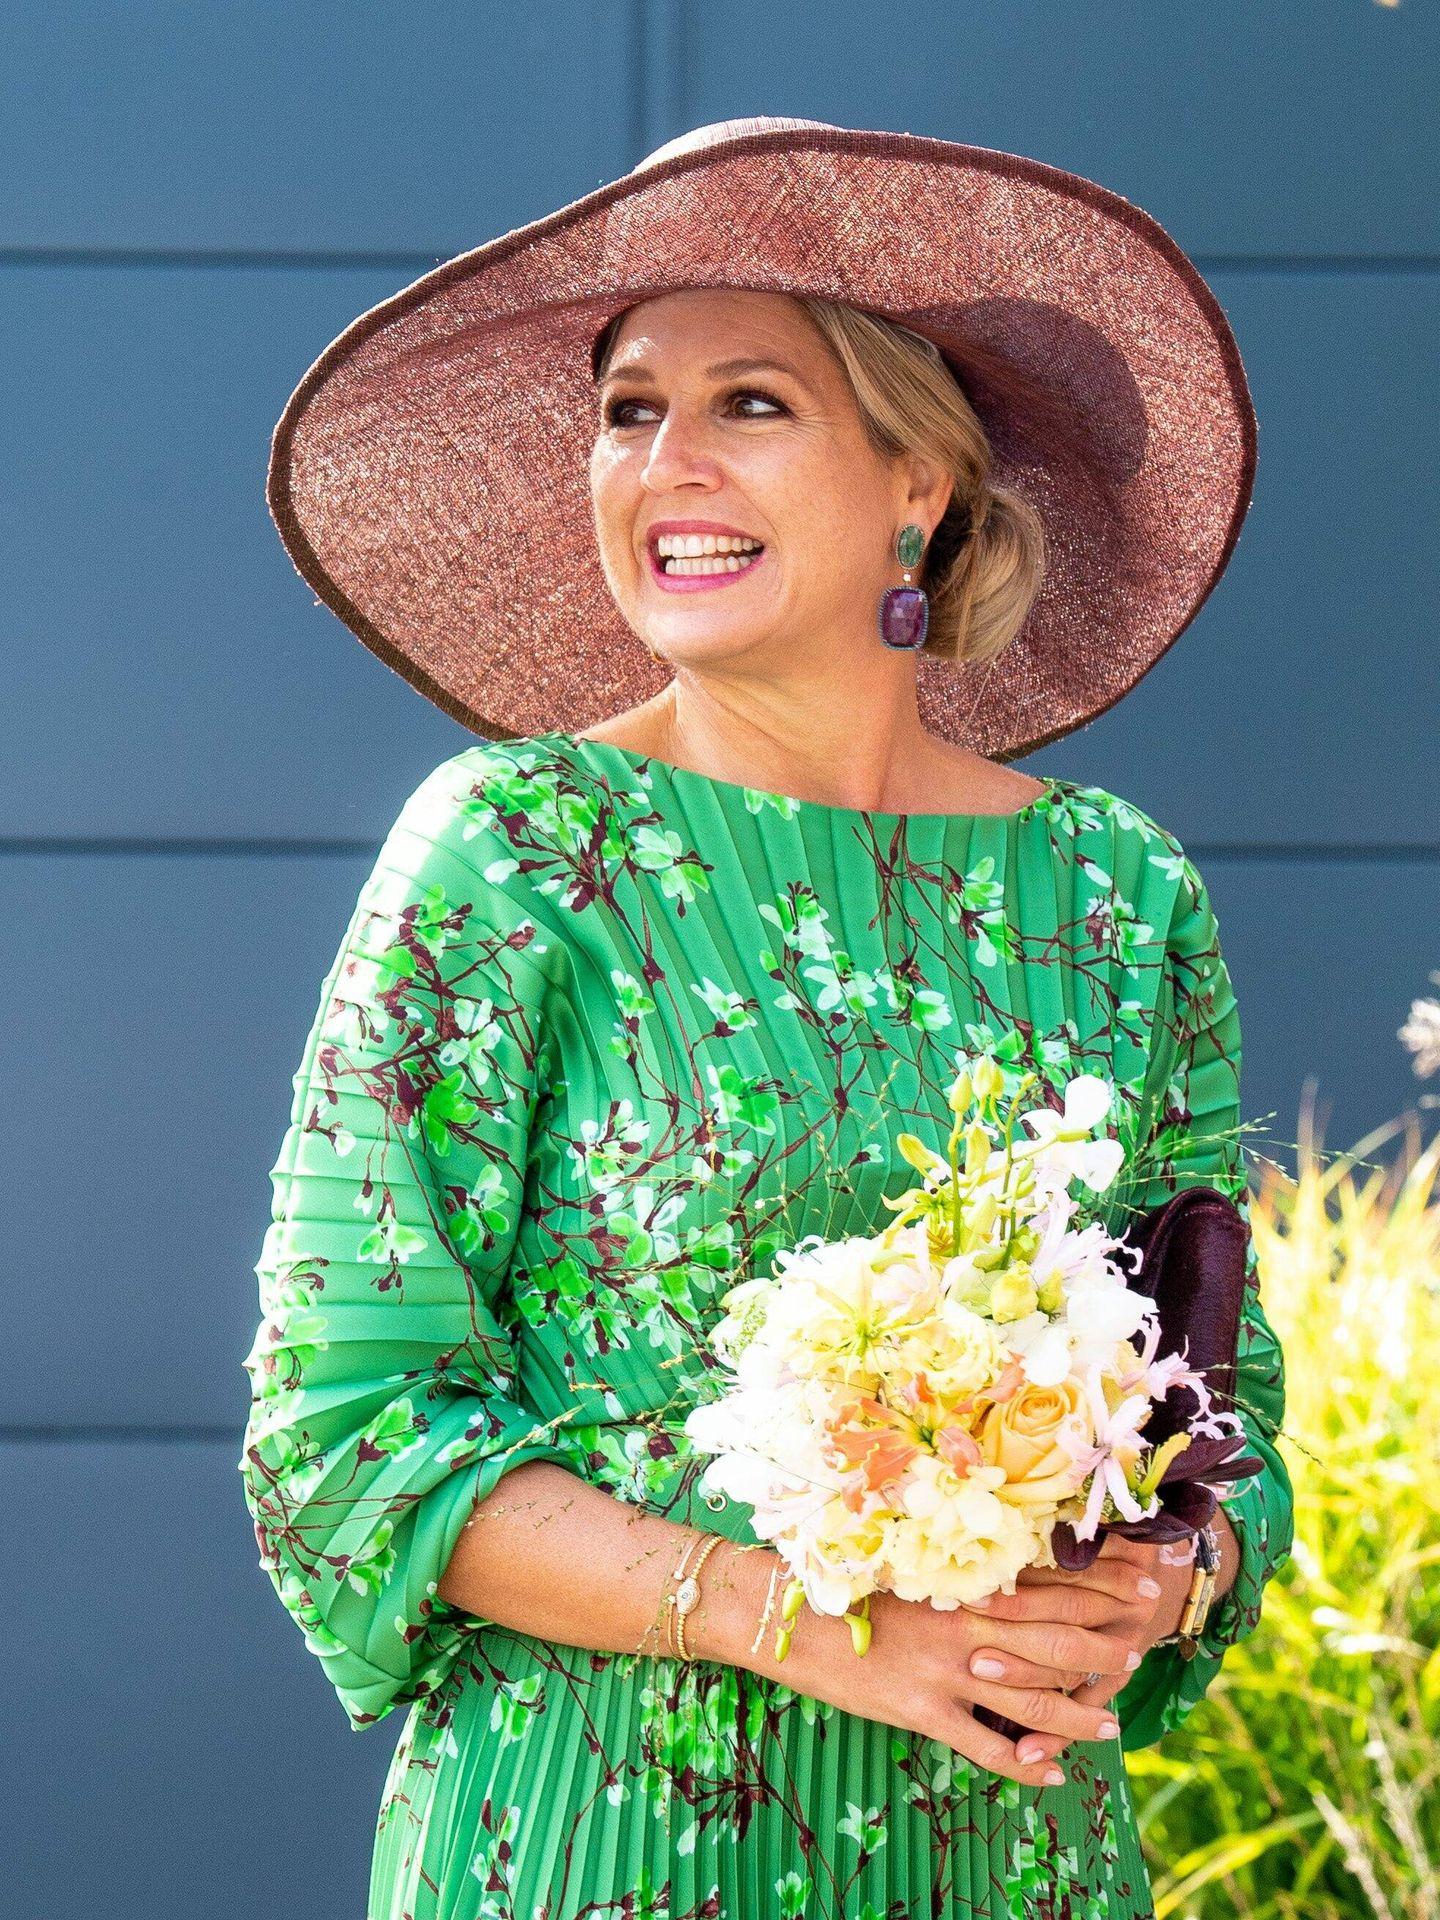 La reina Máxima, en Salland. (Cordon Press)